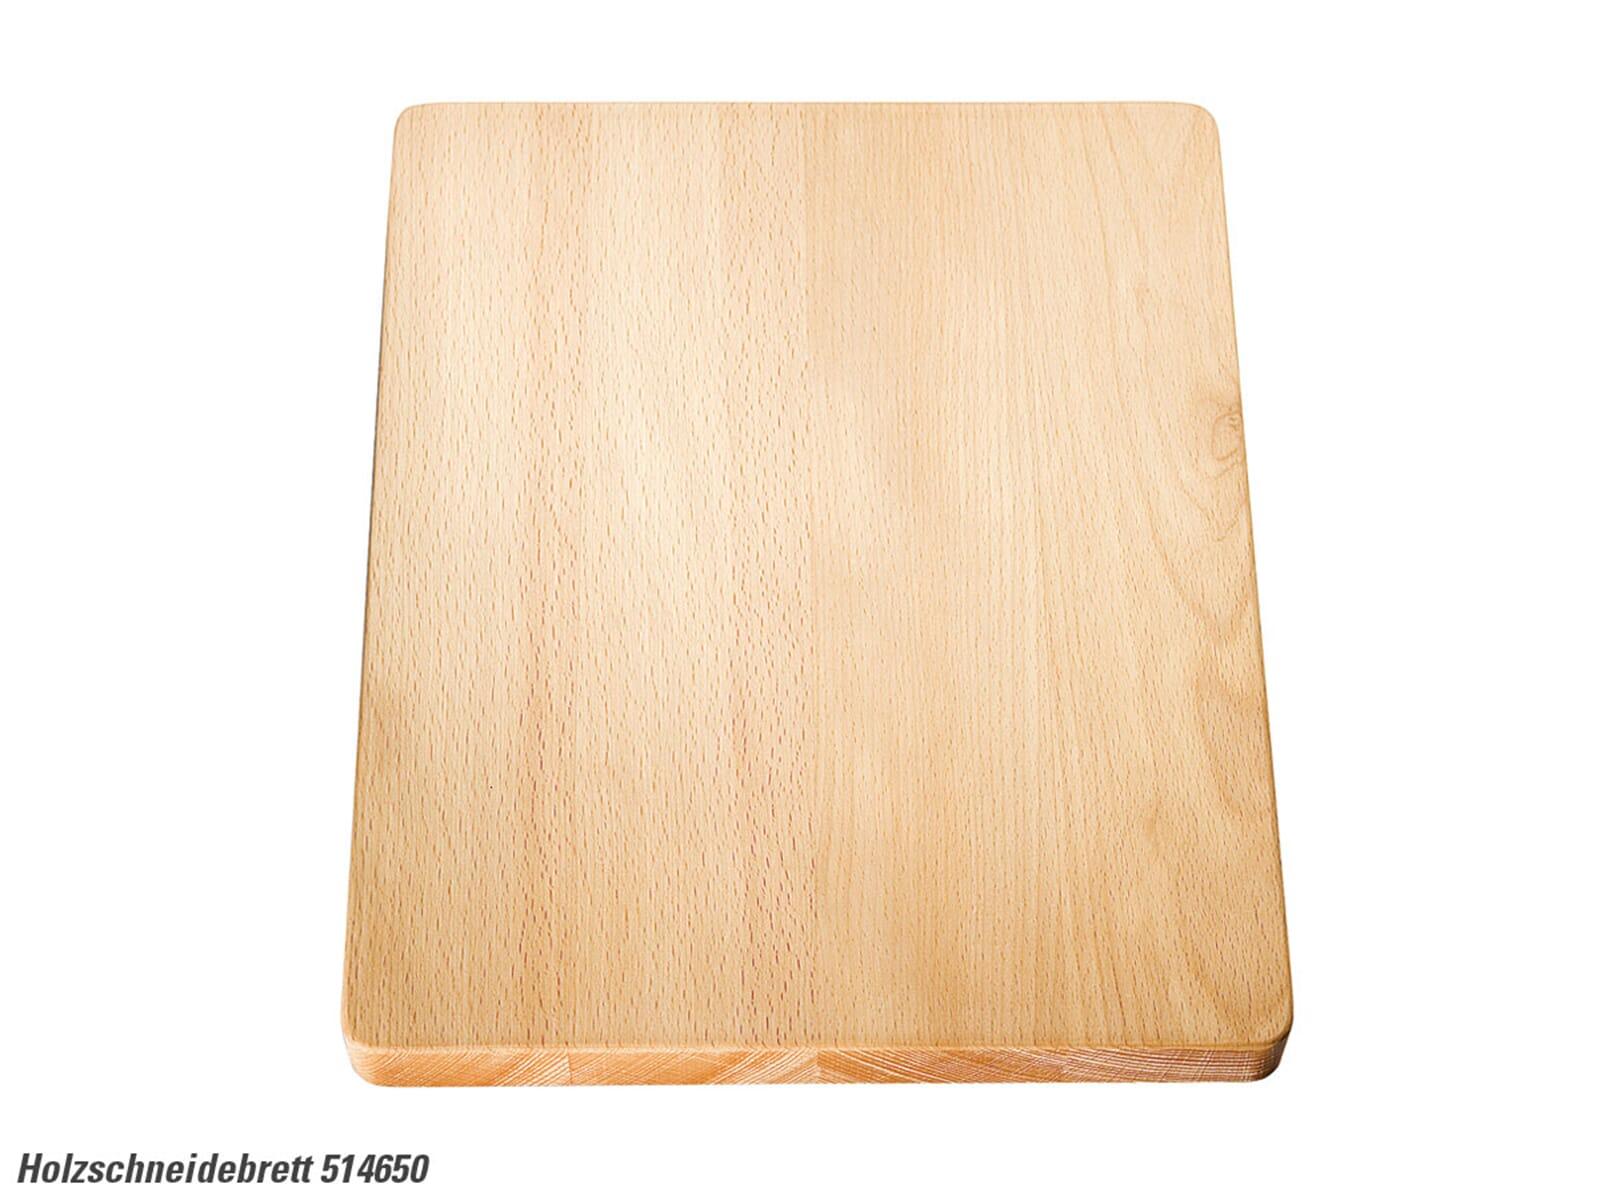 Blanco 514 651 Holzschneidebrett Buche